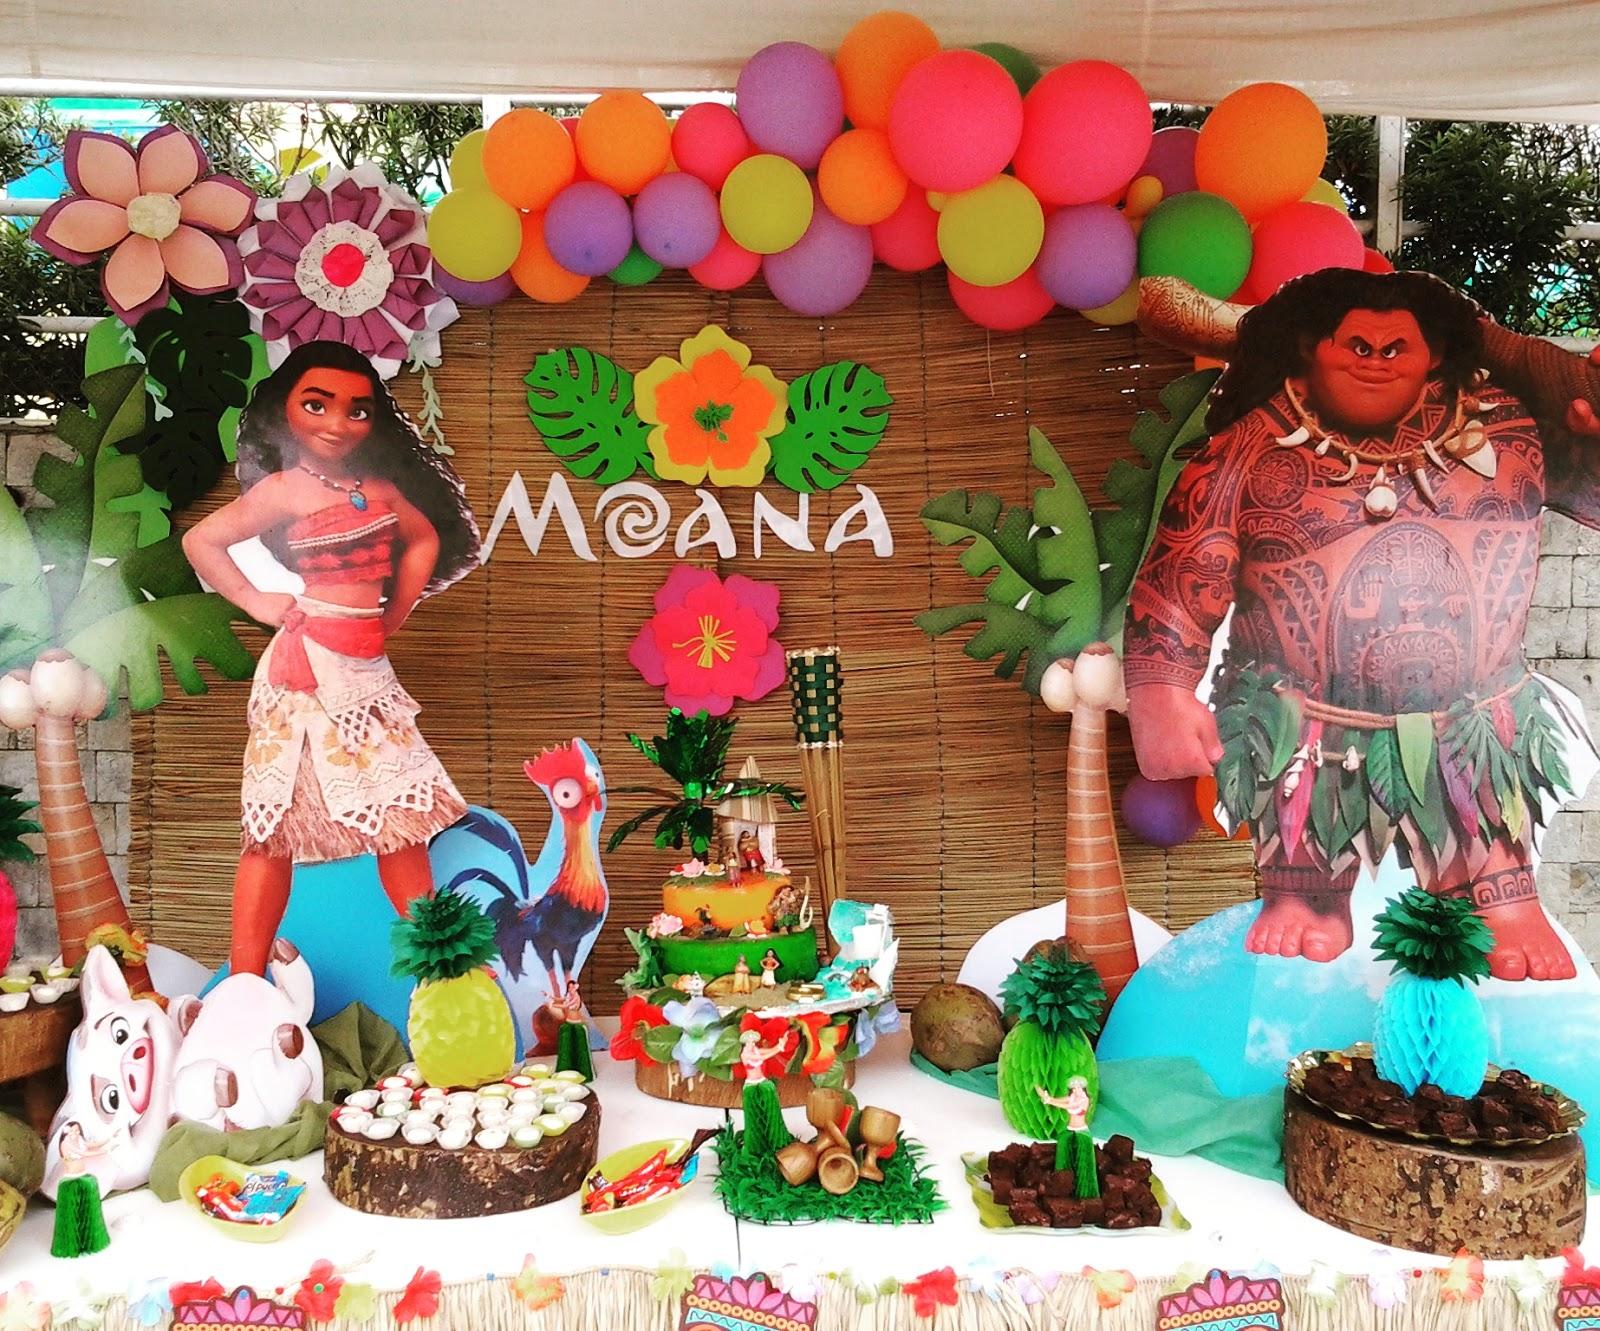 Pkelandia decoraci n de moana - Decoracion de una ...